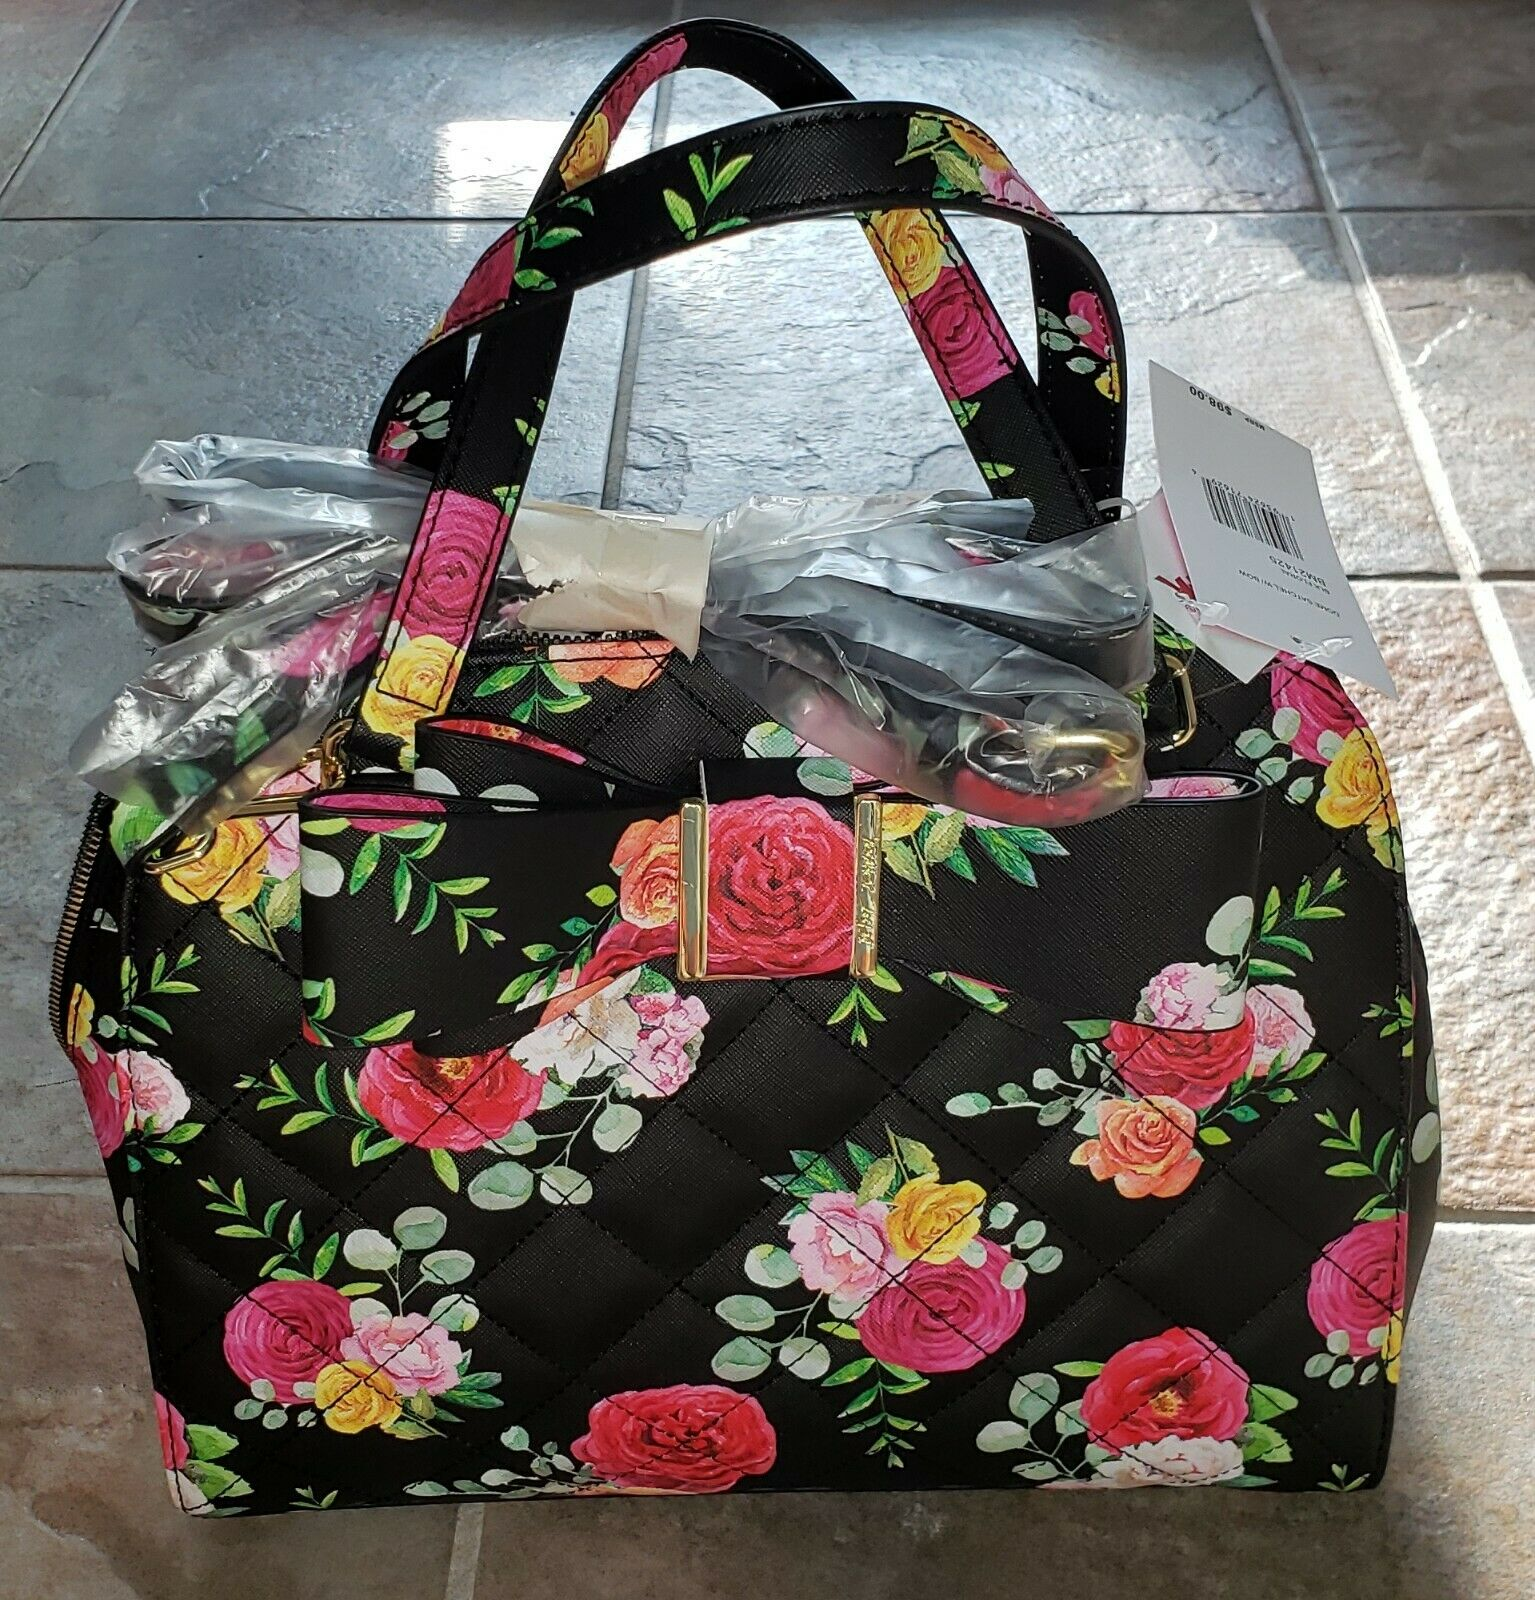 Betsy Johnson Handbag Domed Satchel Black Floral Print With